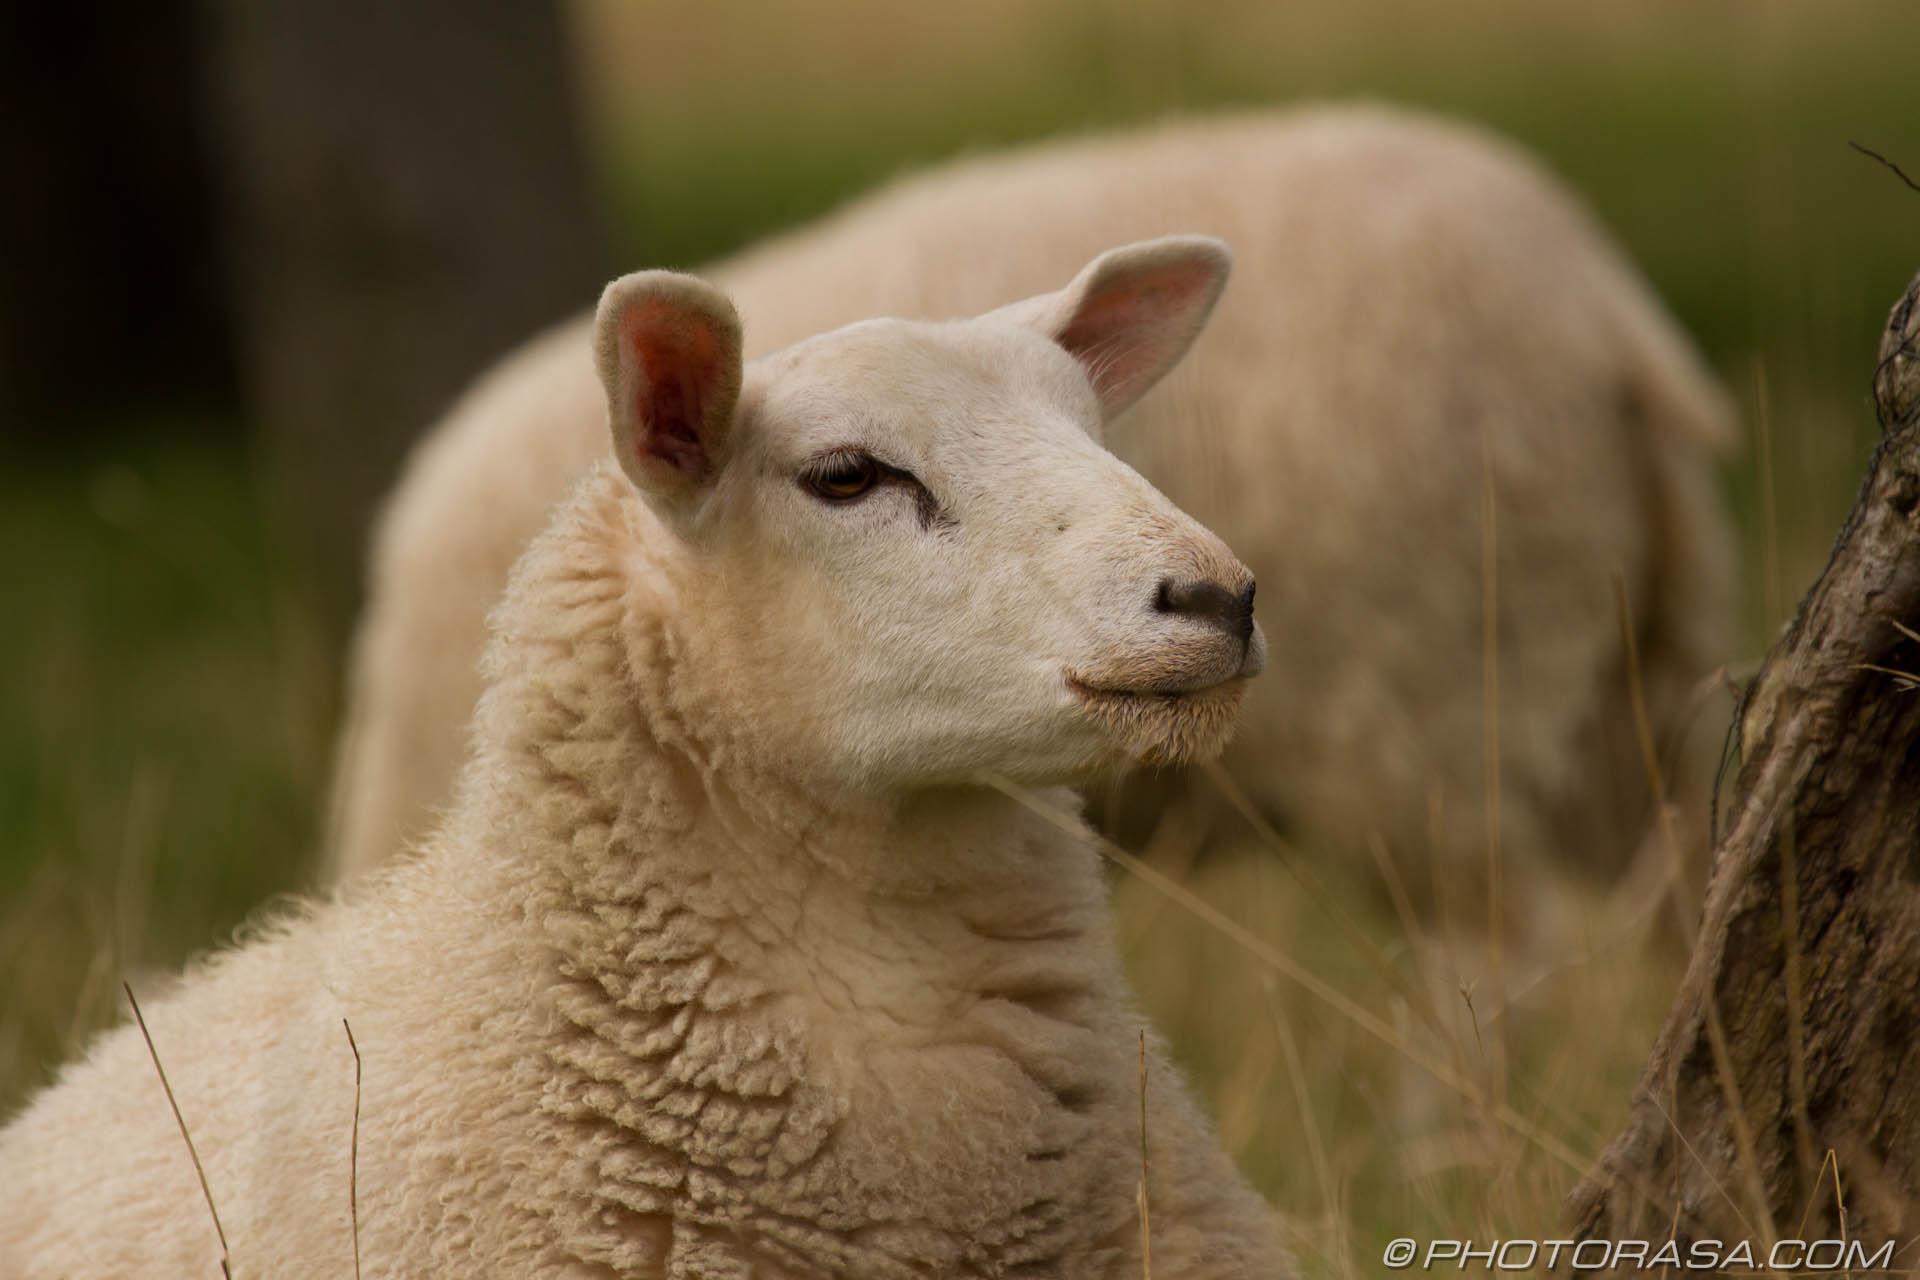 http://photorasa.com/sheep/sheep-looking-across/